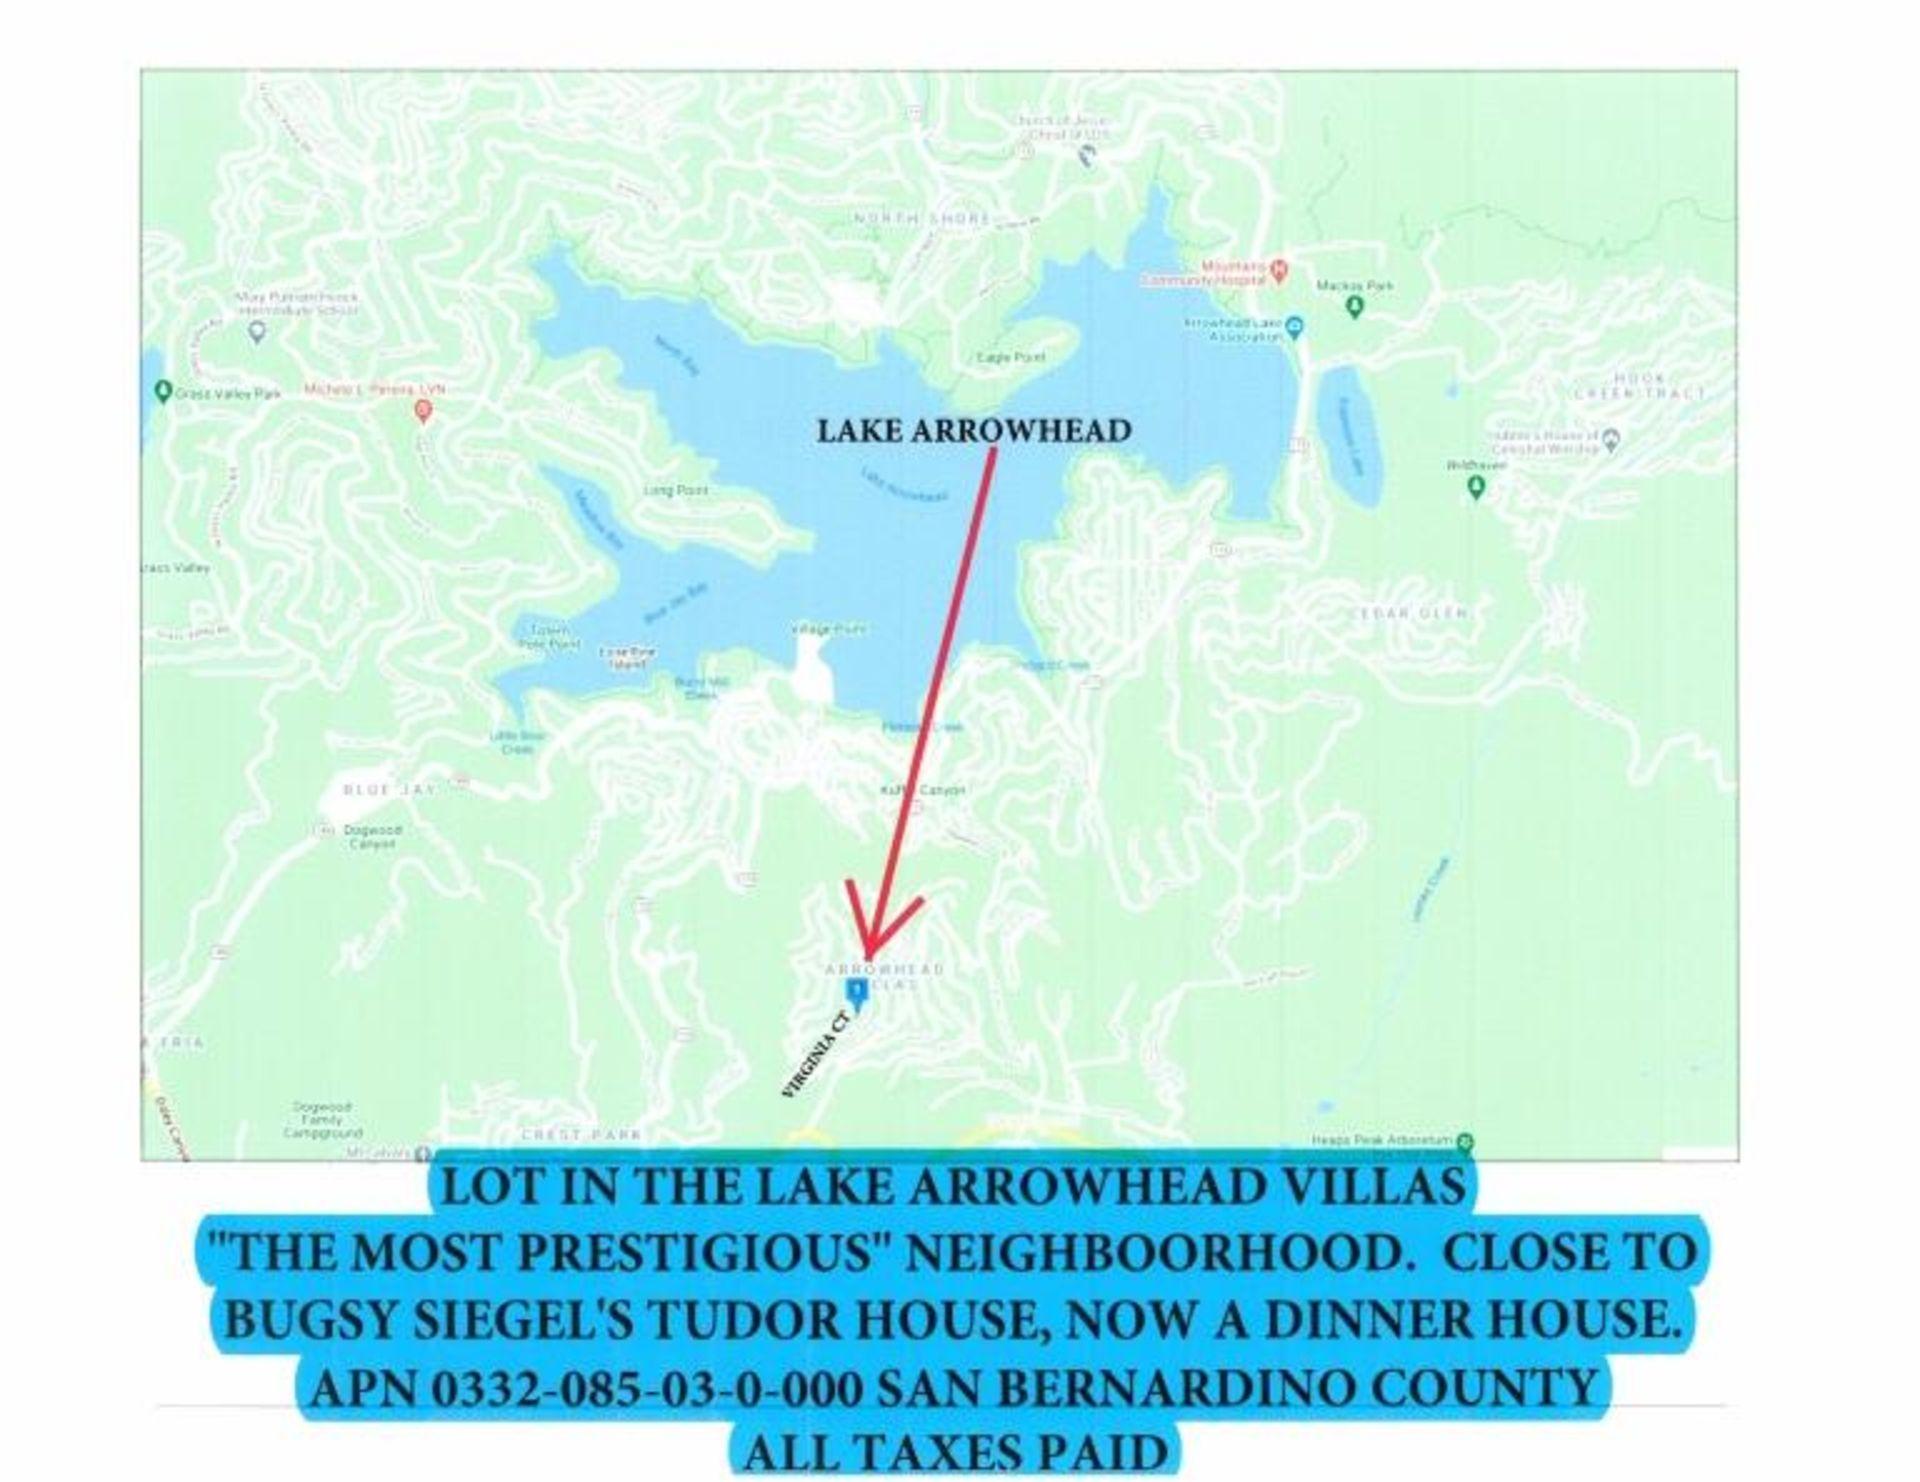 Vacant Parcel near Lake Arrowead, - Image 2 of 2